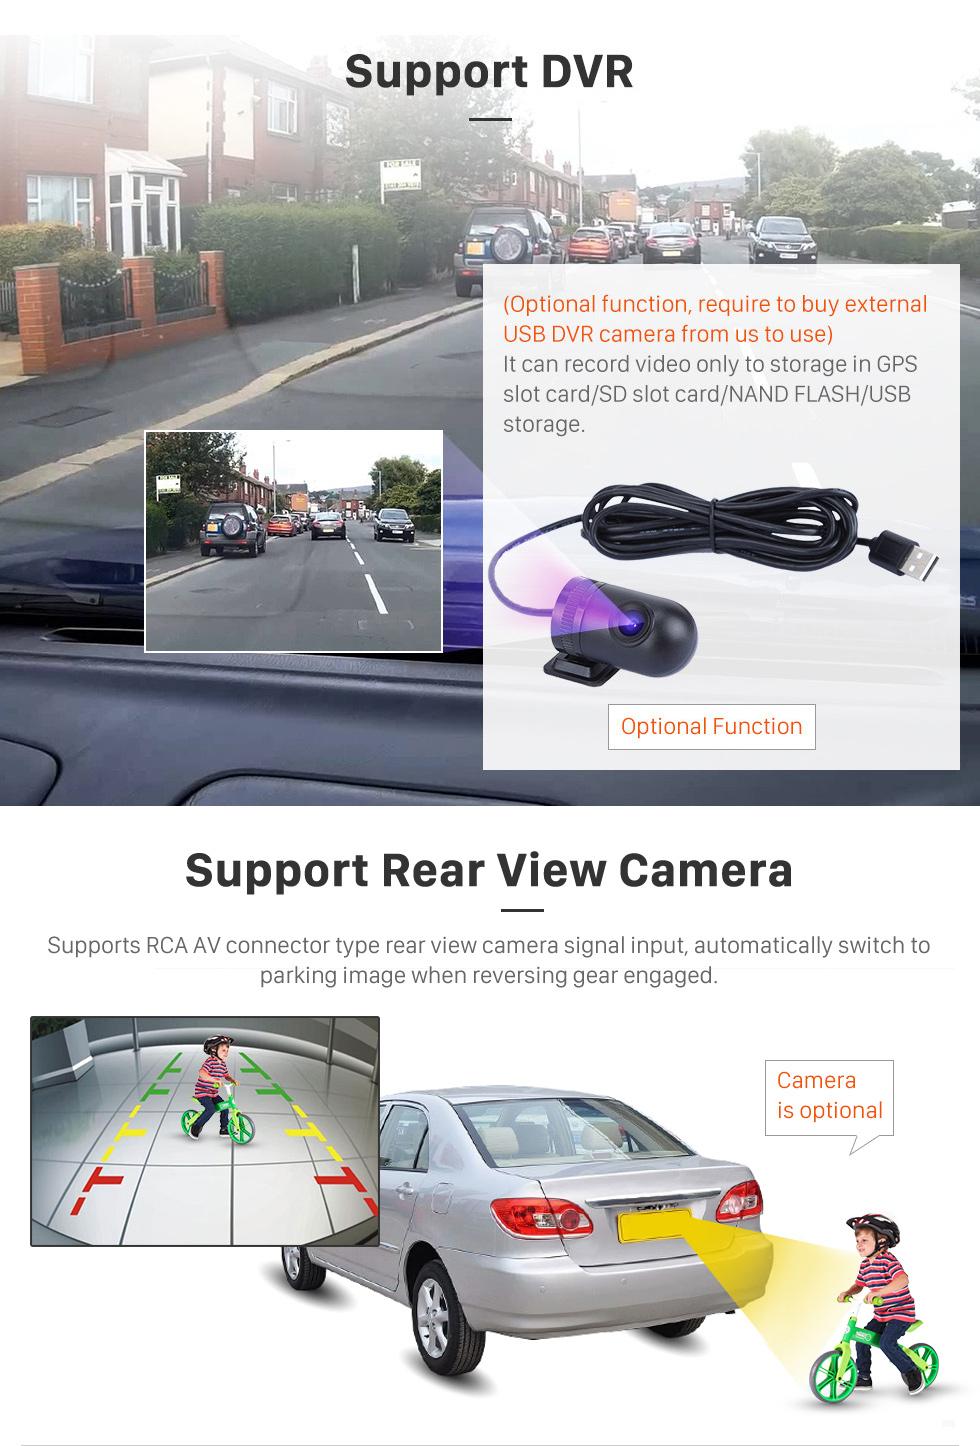 Seicane 9 pulgadas 2015 Hyundai Starex H1 Android 9.0 Navegación GPS Radio Bluetooth HD Pantalla táctil AUX USB Carplay ayuda Enlace espejo